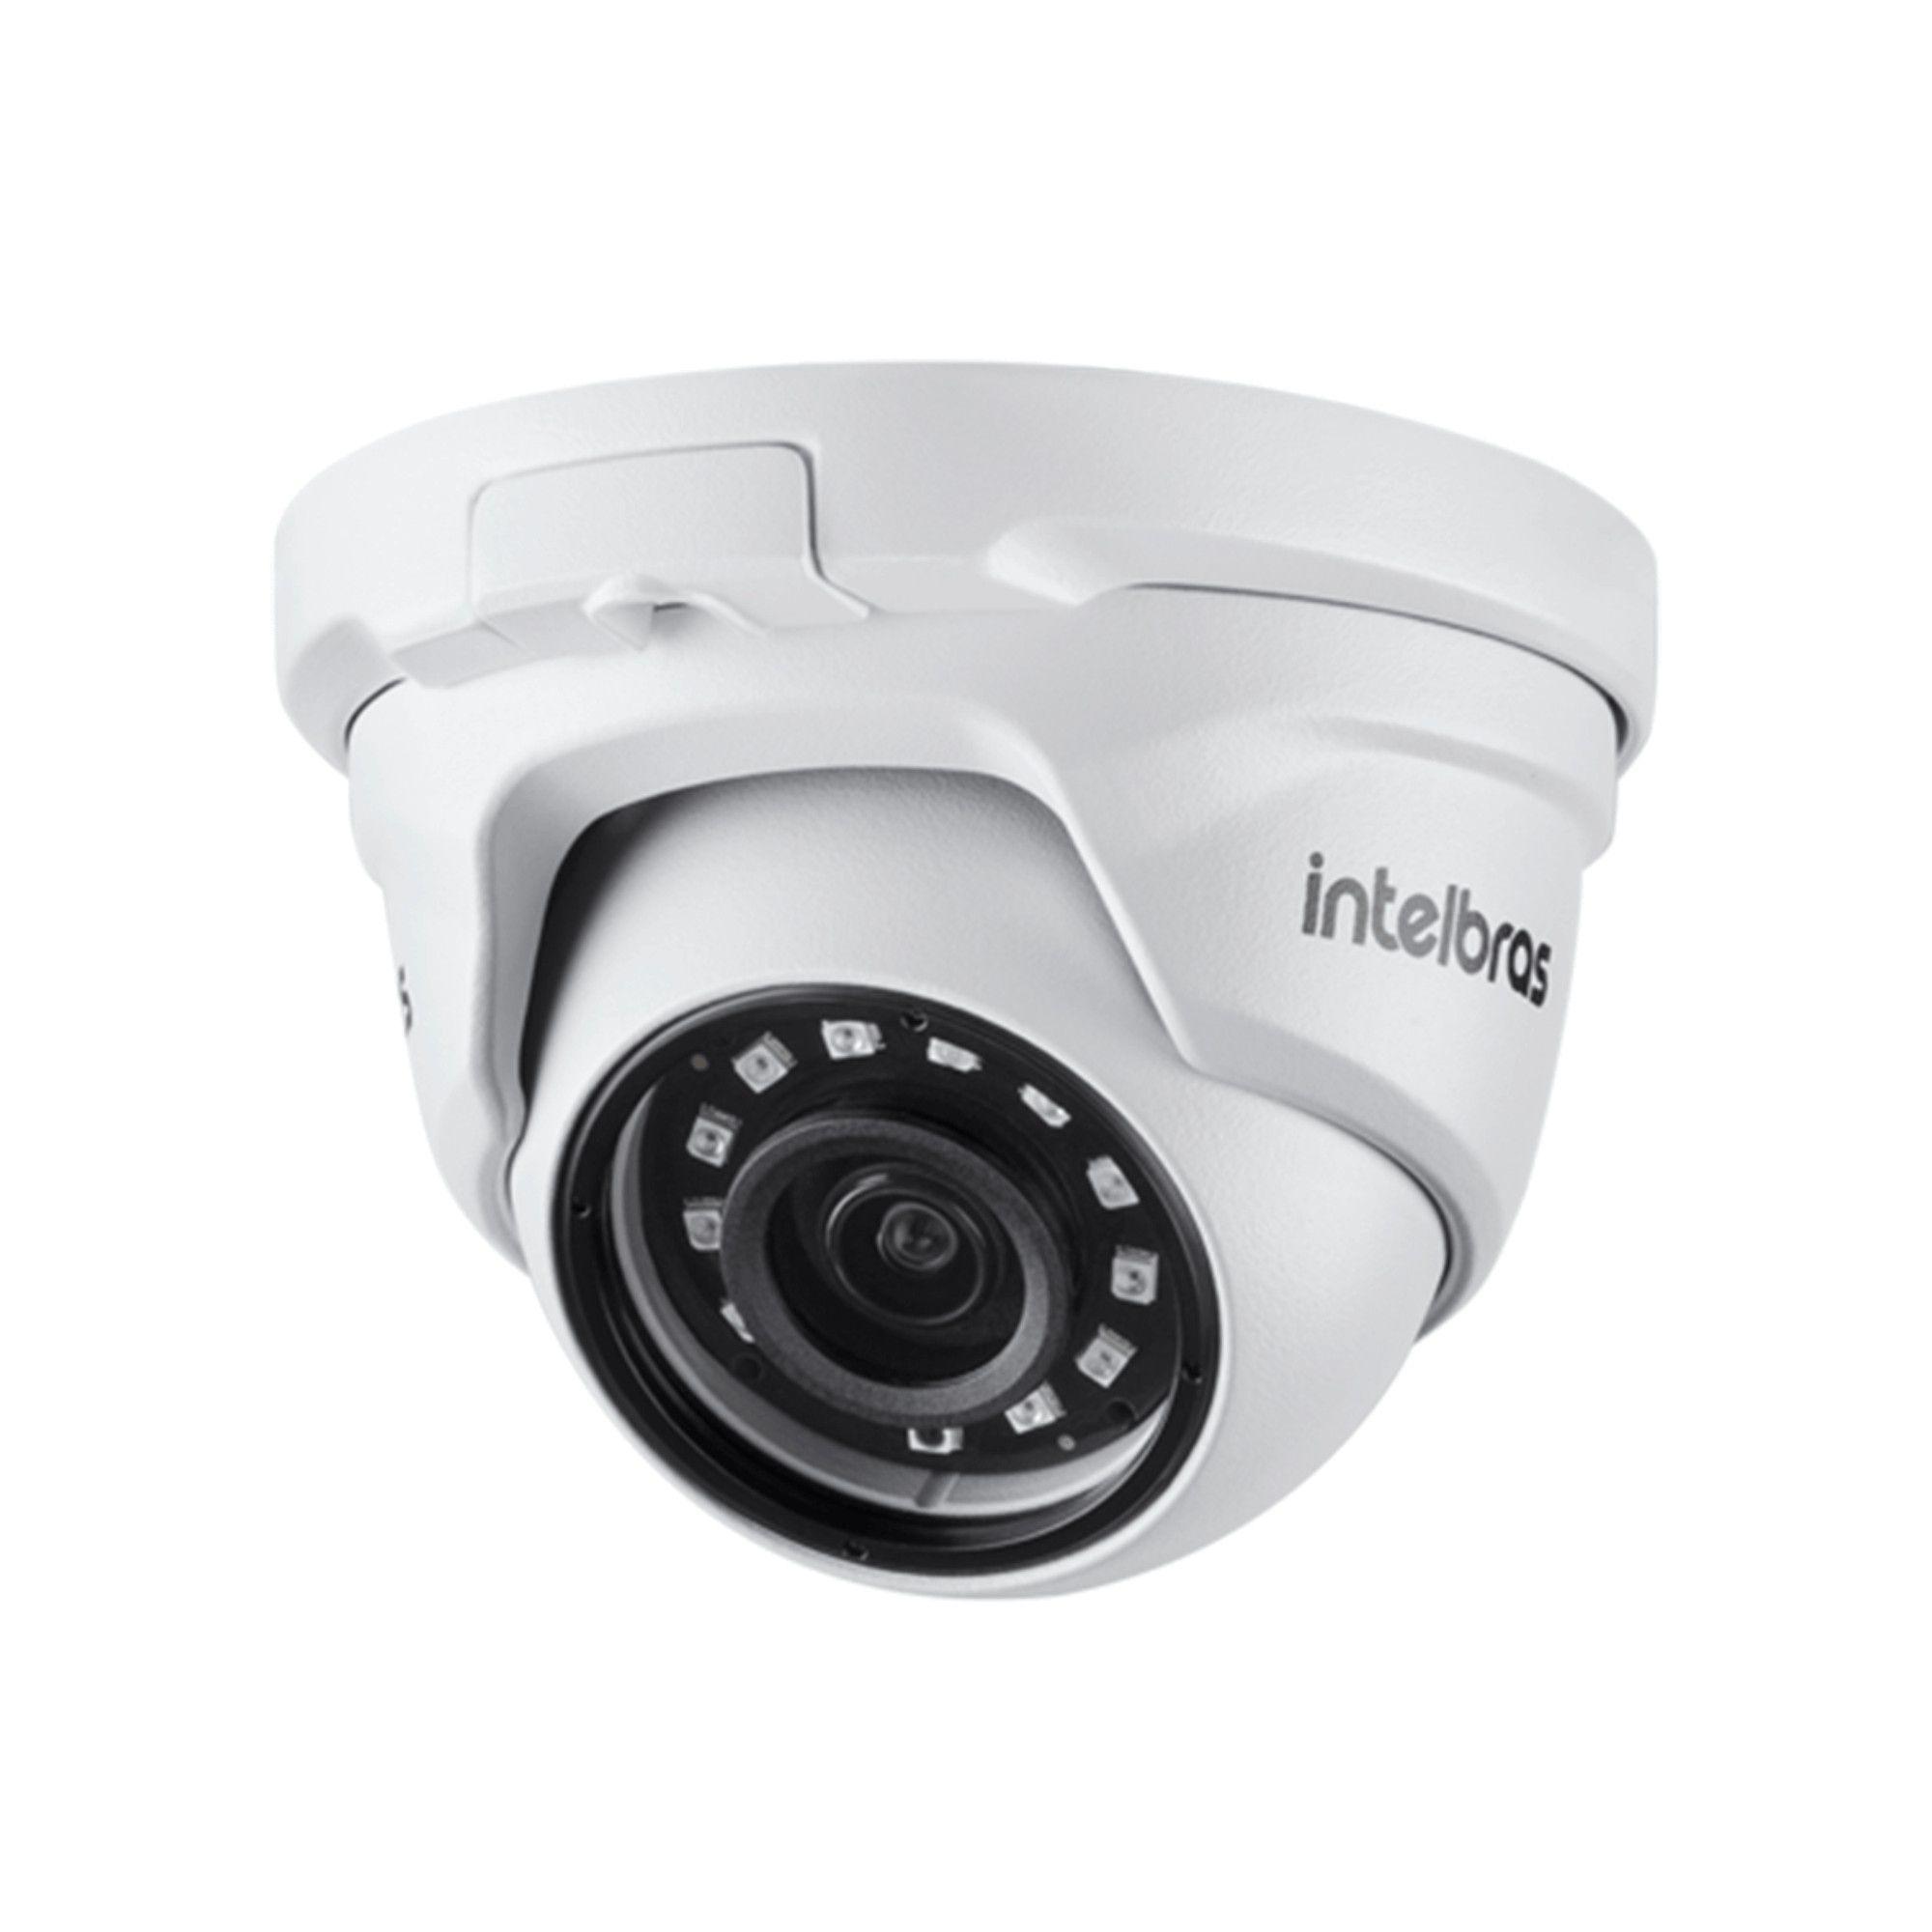 Kit CFTV Intelbras Completo 12 Câmeras AHD 720p DVR 16 Canais